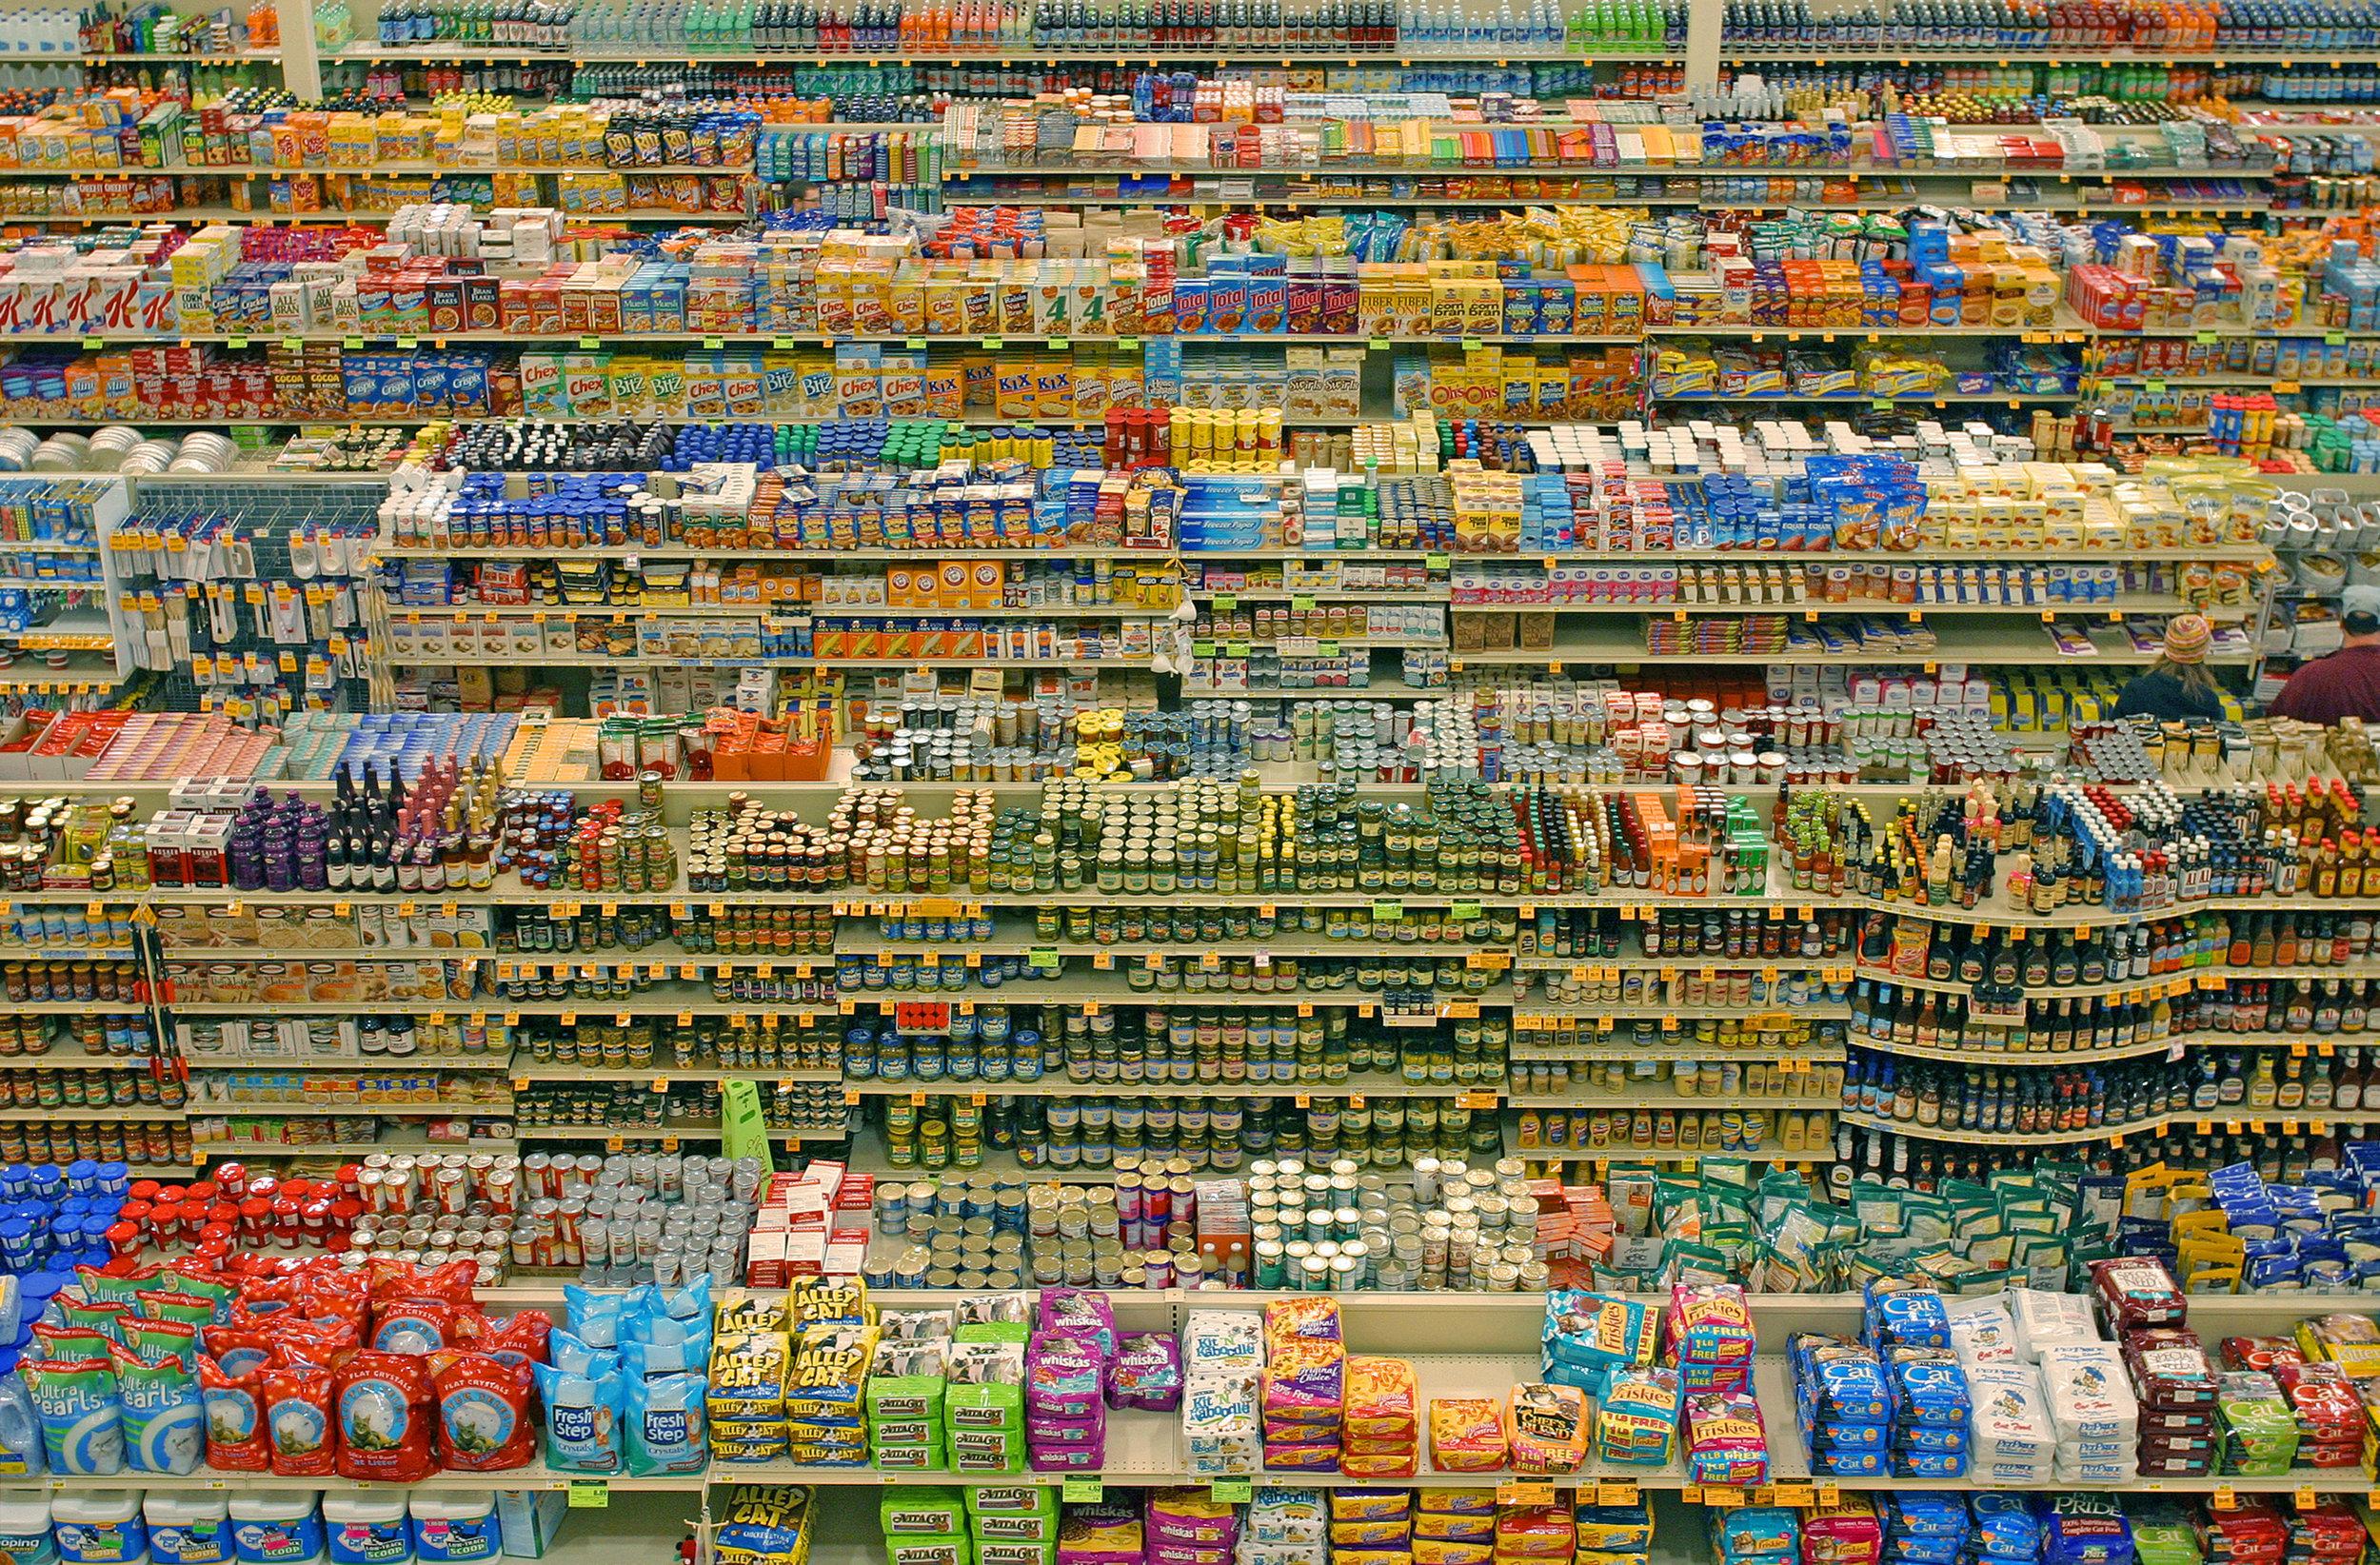 Unsustainable food